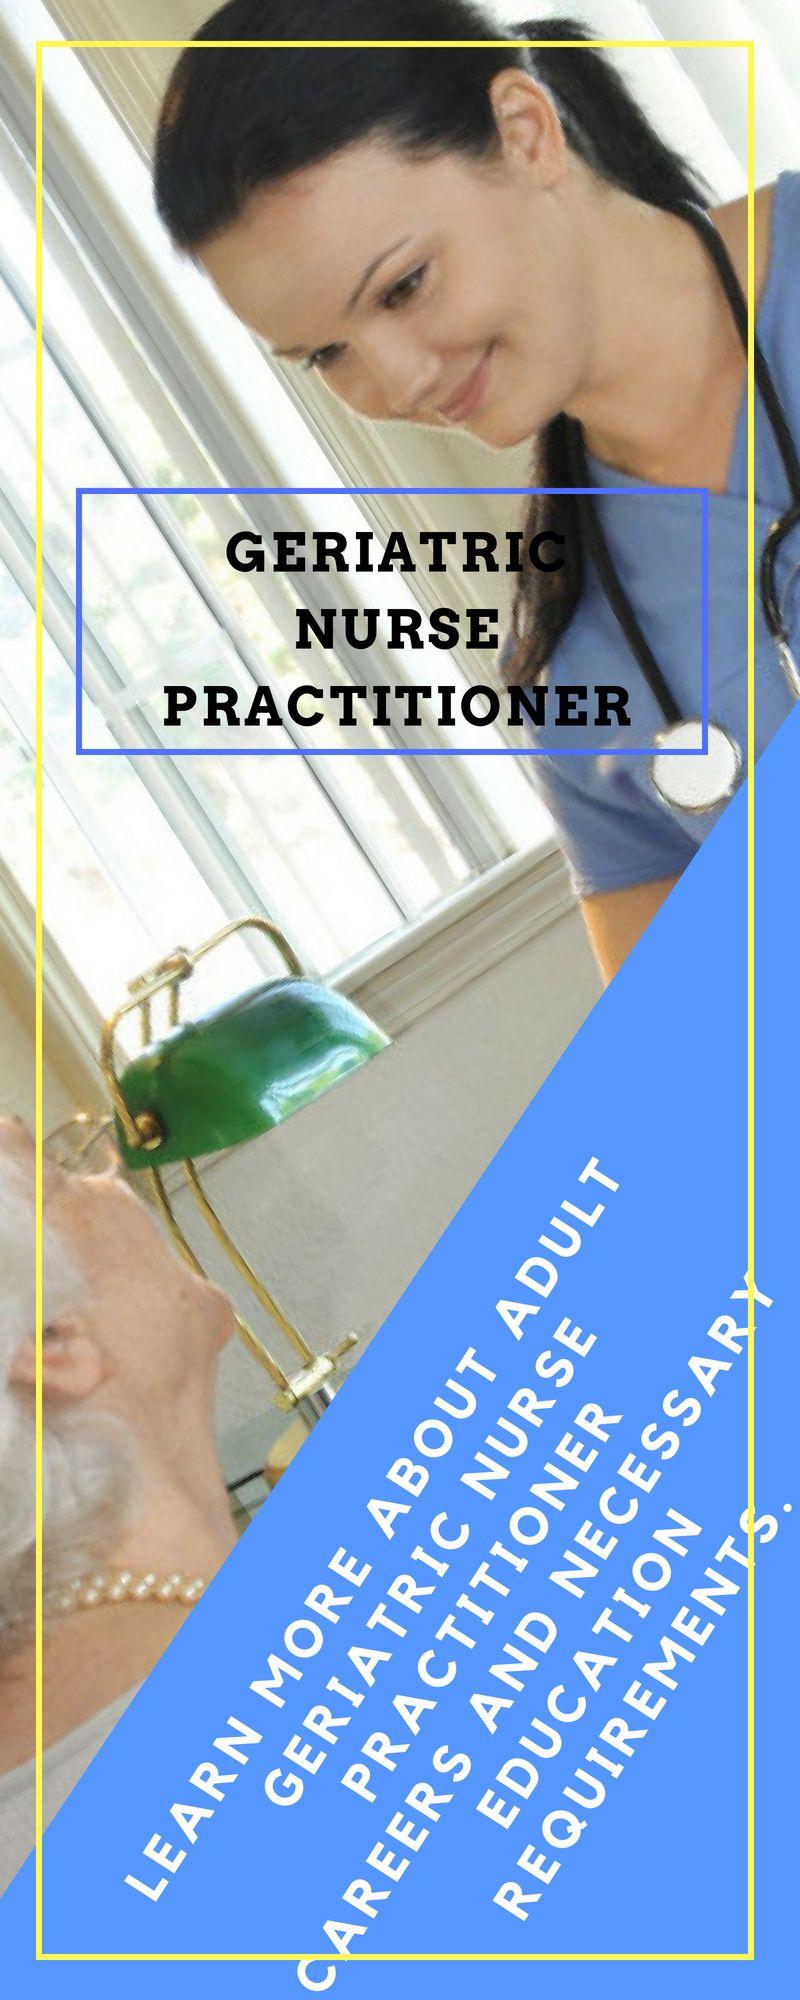 Geriatric Nurse Salary, Job Description, Duties and